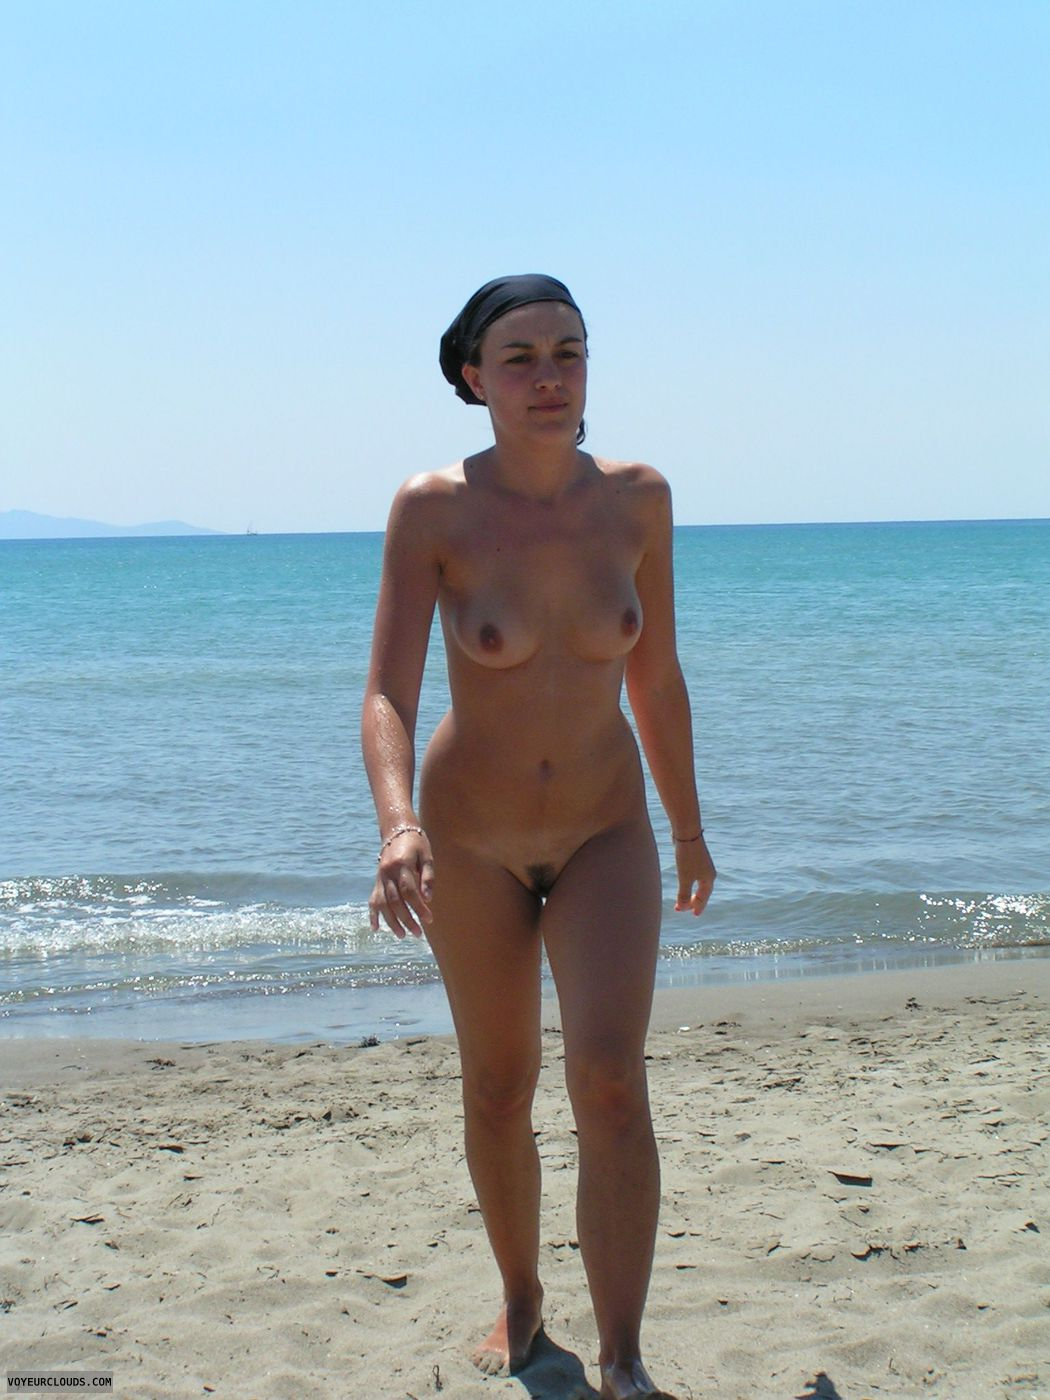 voyeurclouds com nude voyeurclouds com nude